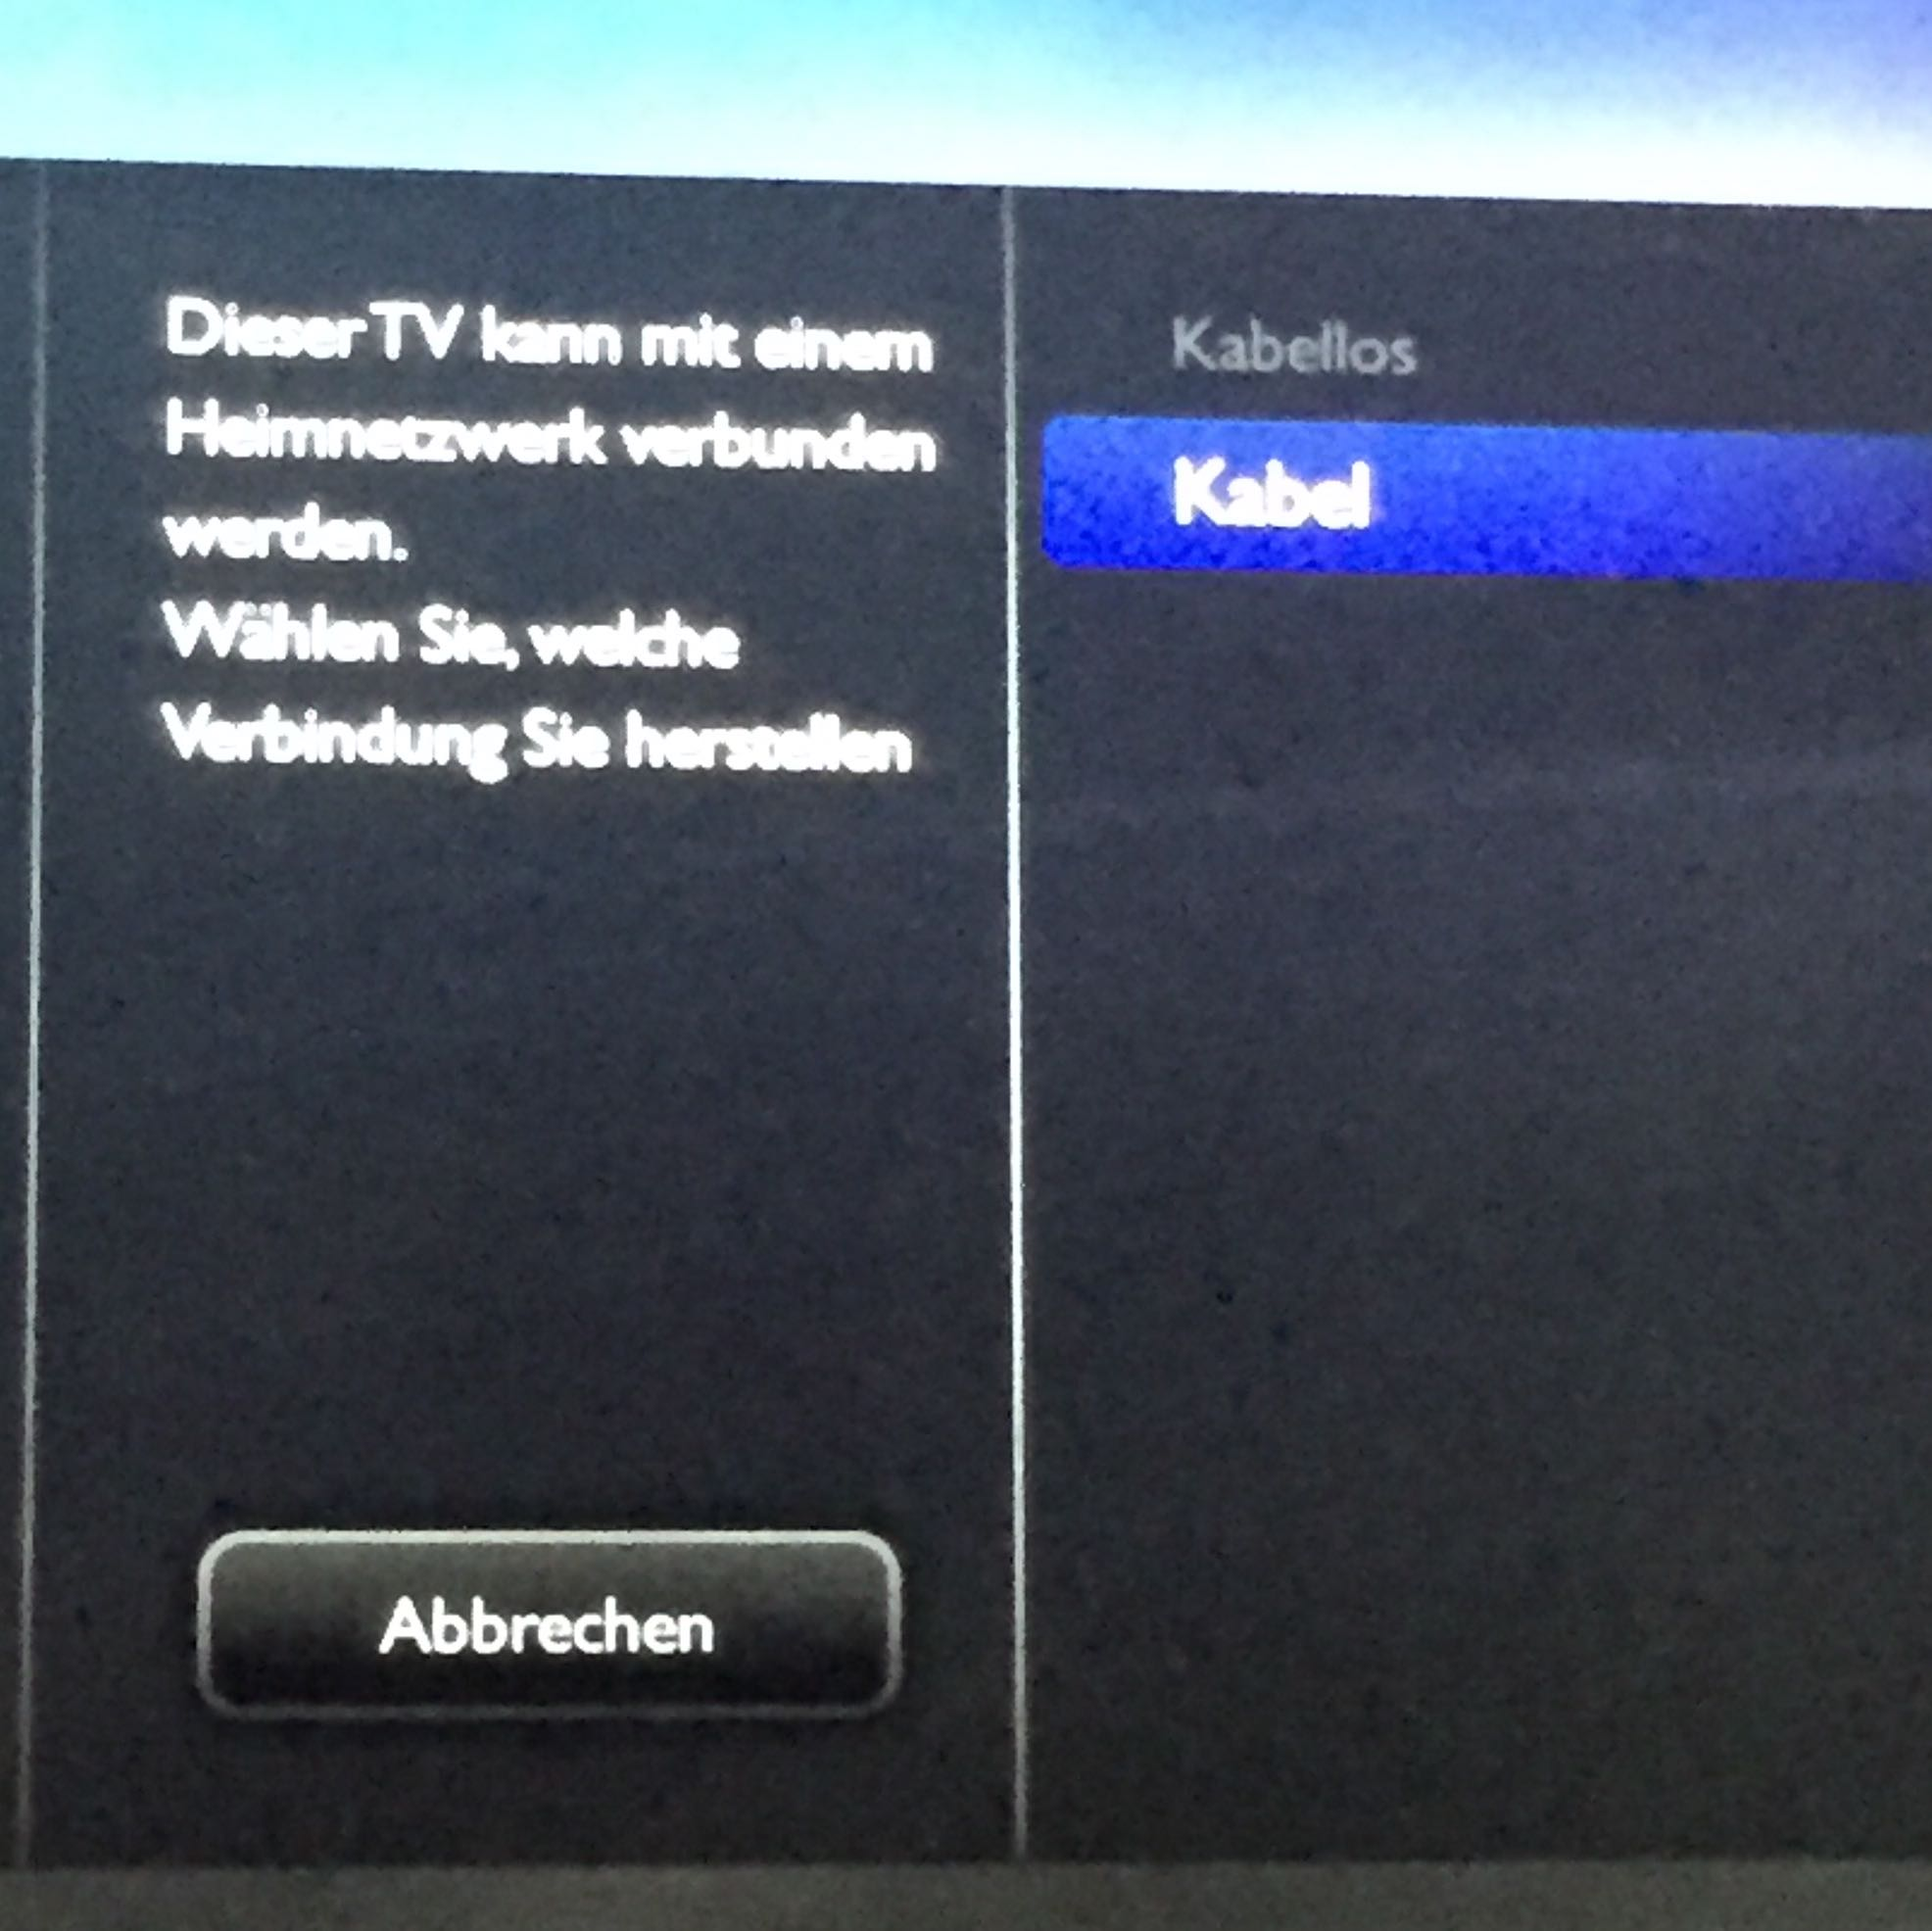 phillips tv mit internet verbinden fernseher philips. Black Bedroom Furniture Sets. Home Design Ideas